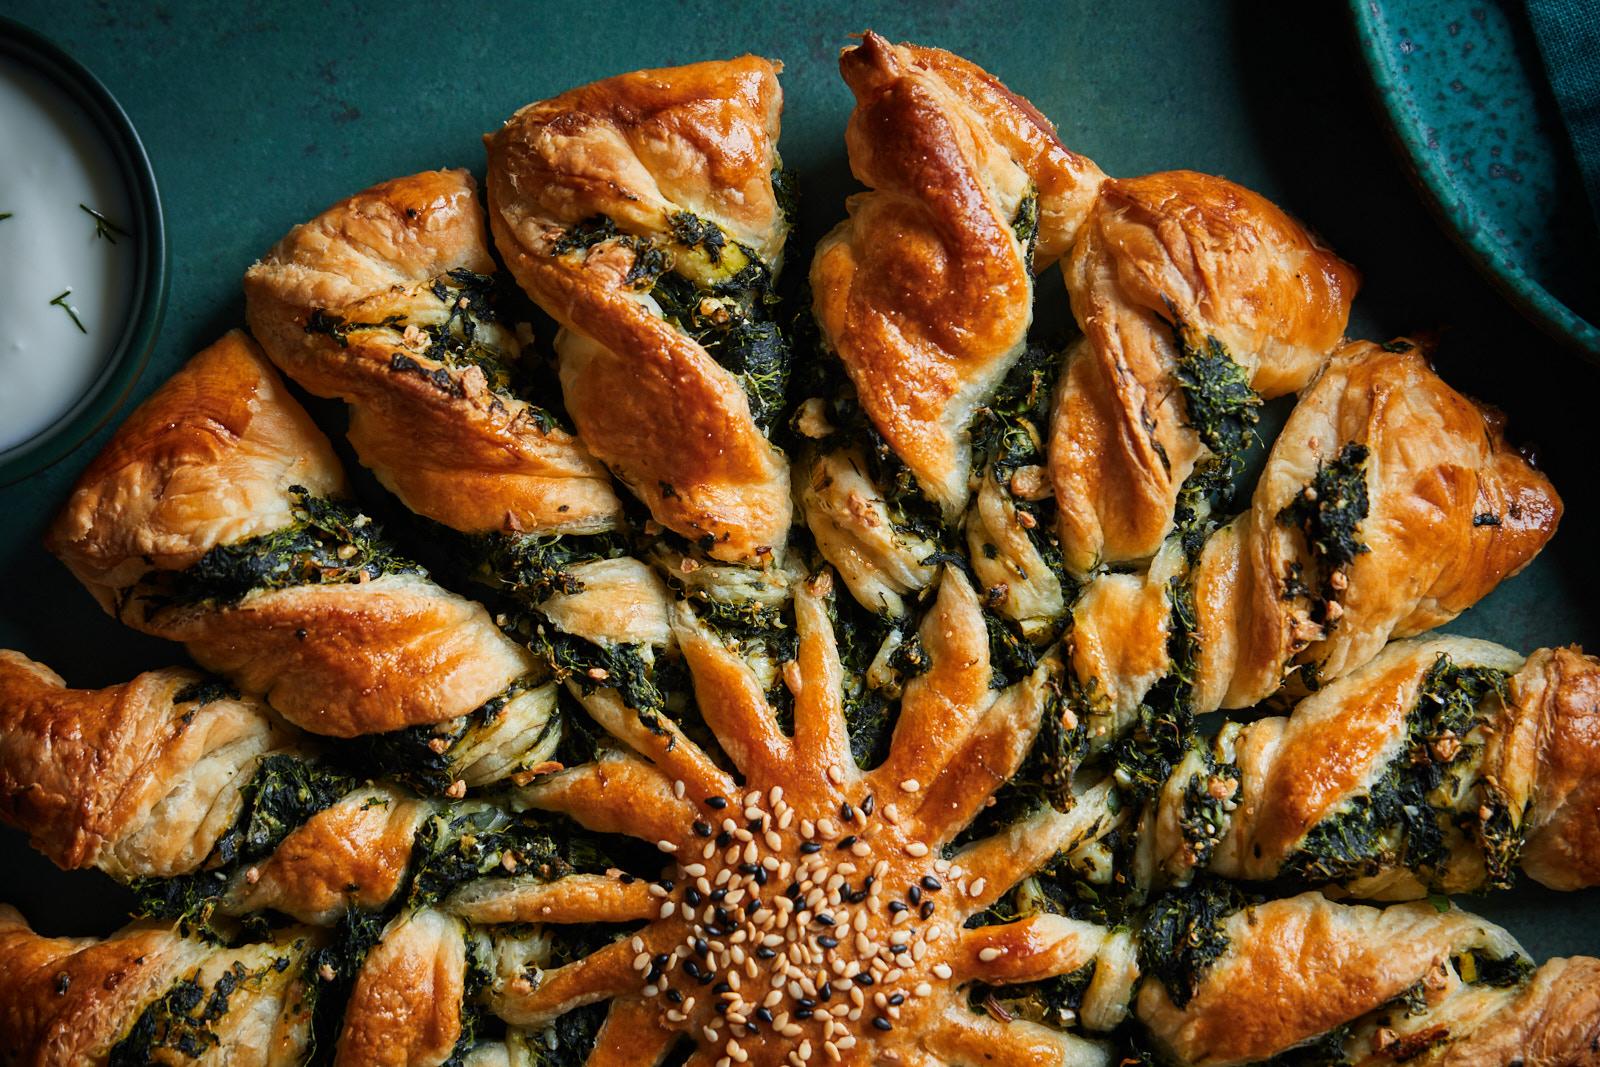 Spanakopita Tarte Soleil (Spinach and Feta Pie)